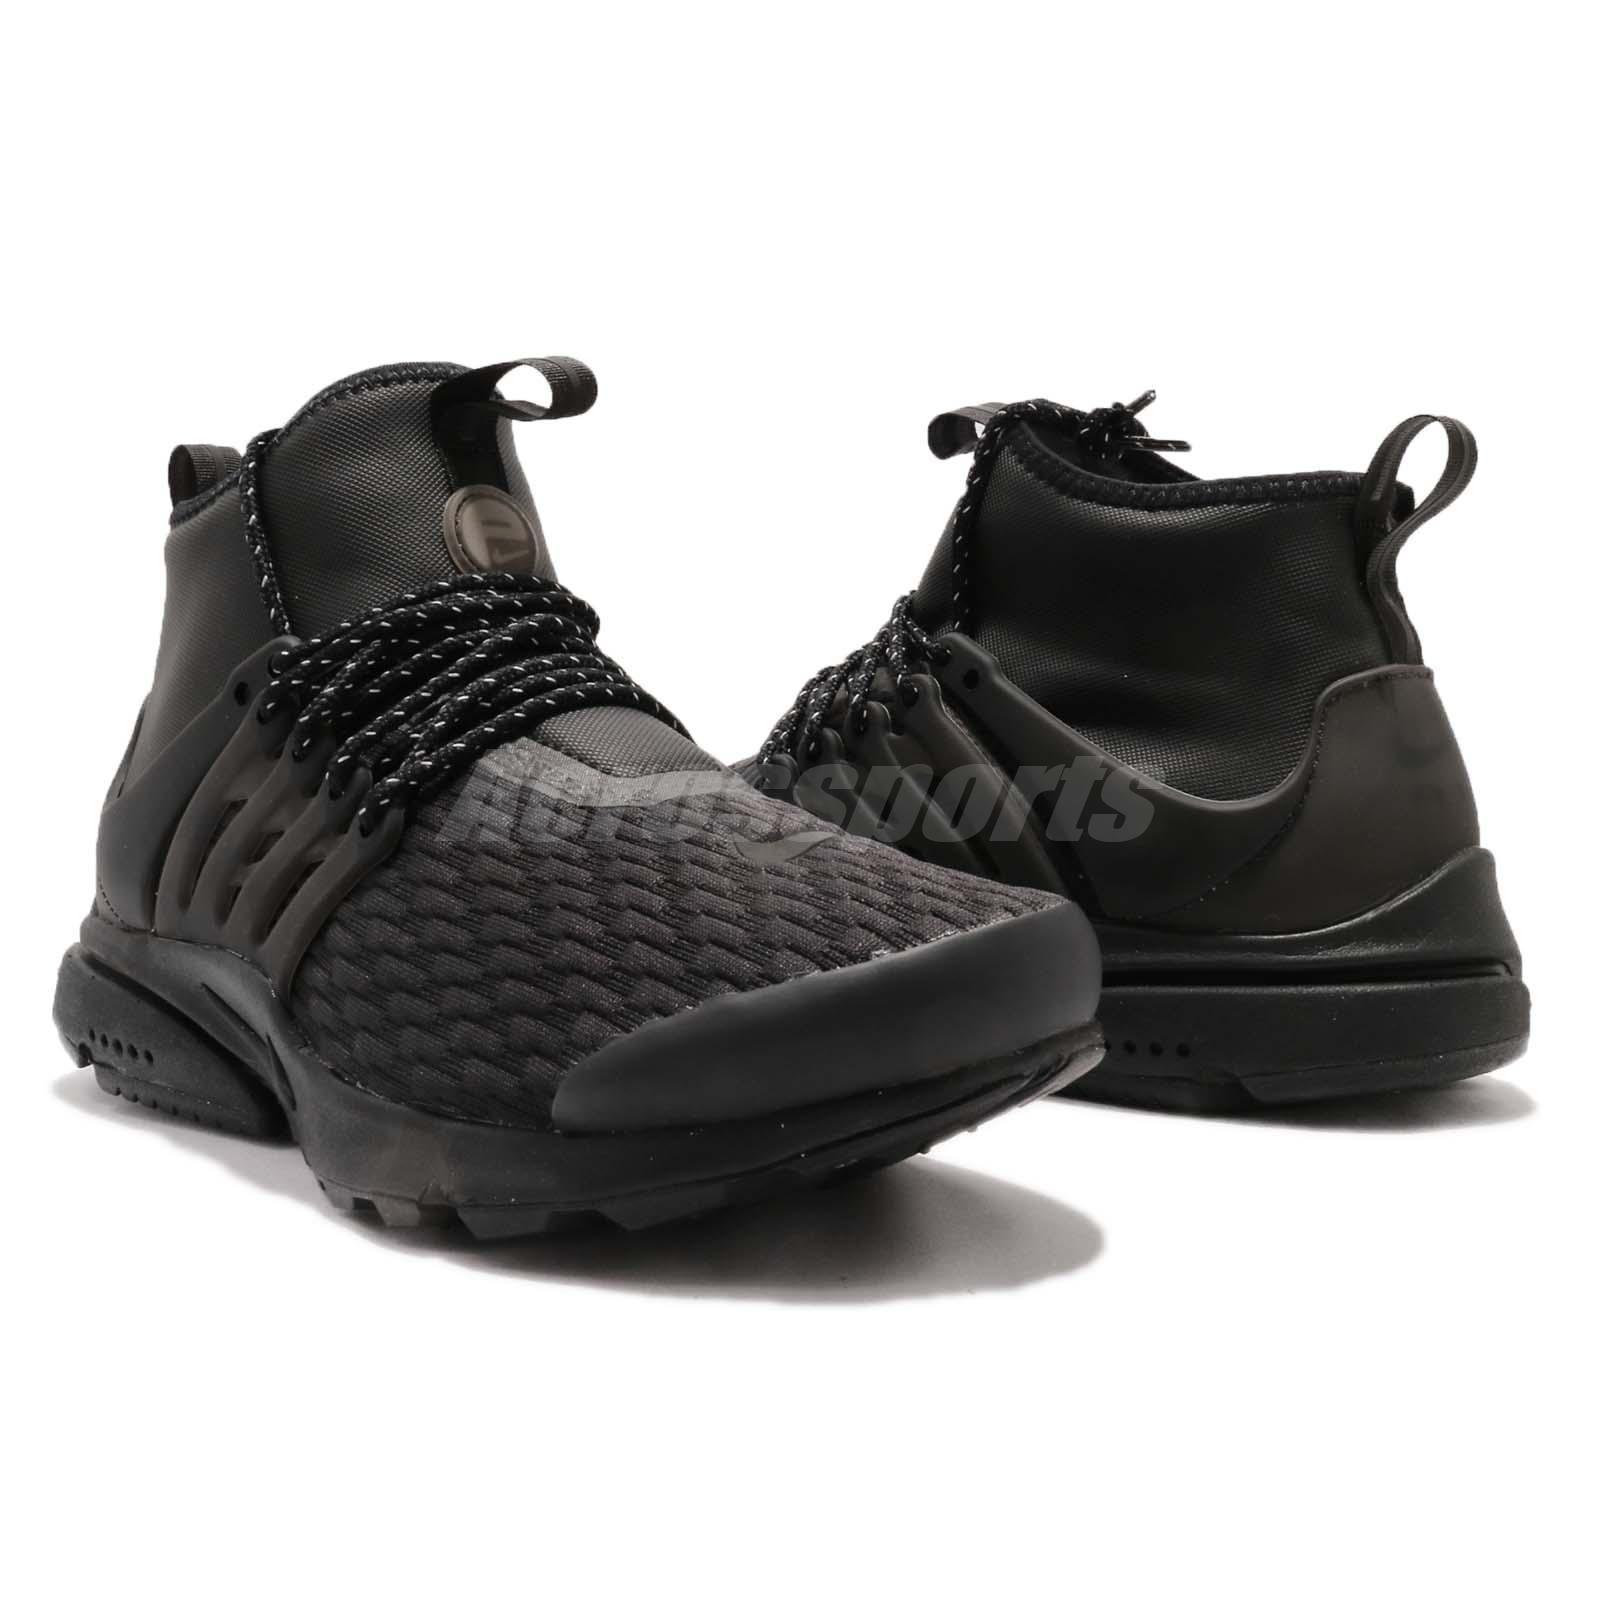 info for 5cb96 2245e Nike Wmns Air Presto Mid Utility PRM Black Womens Casual Shoes ...